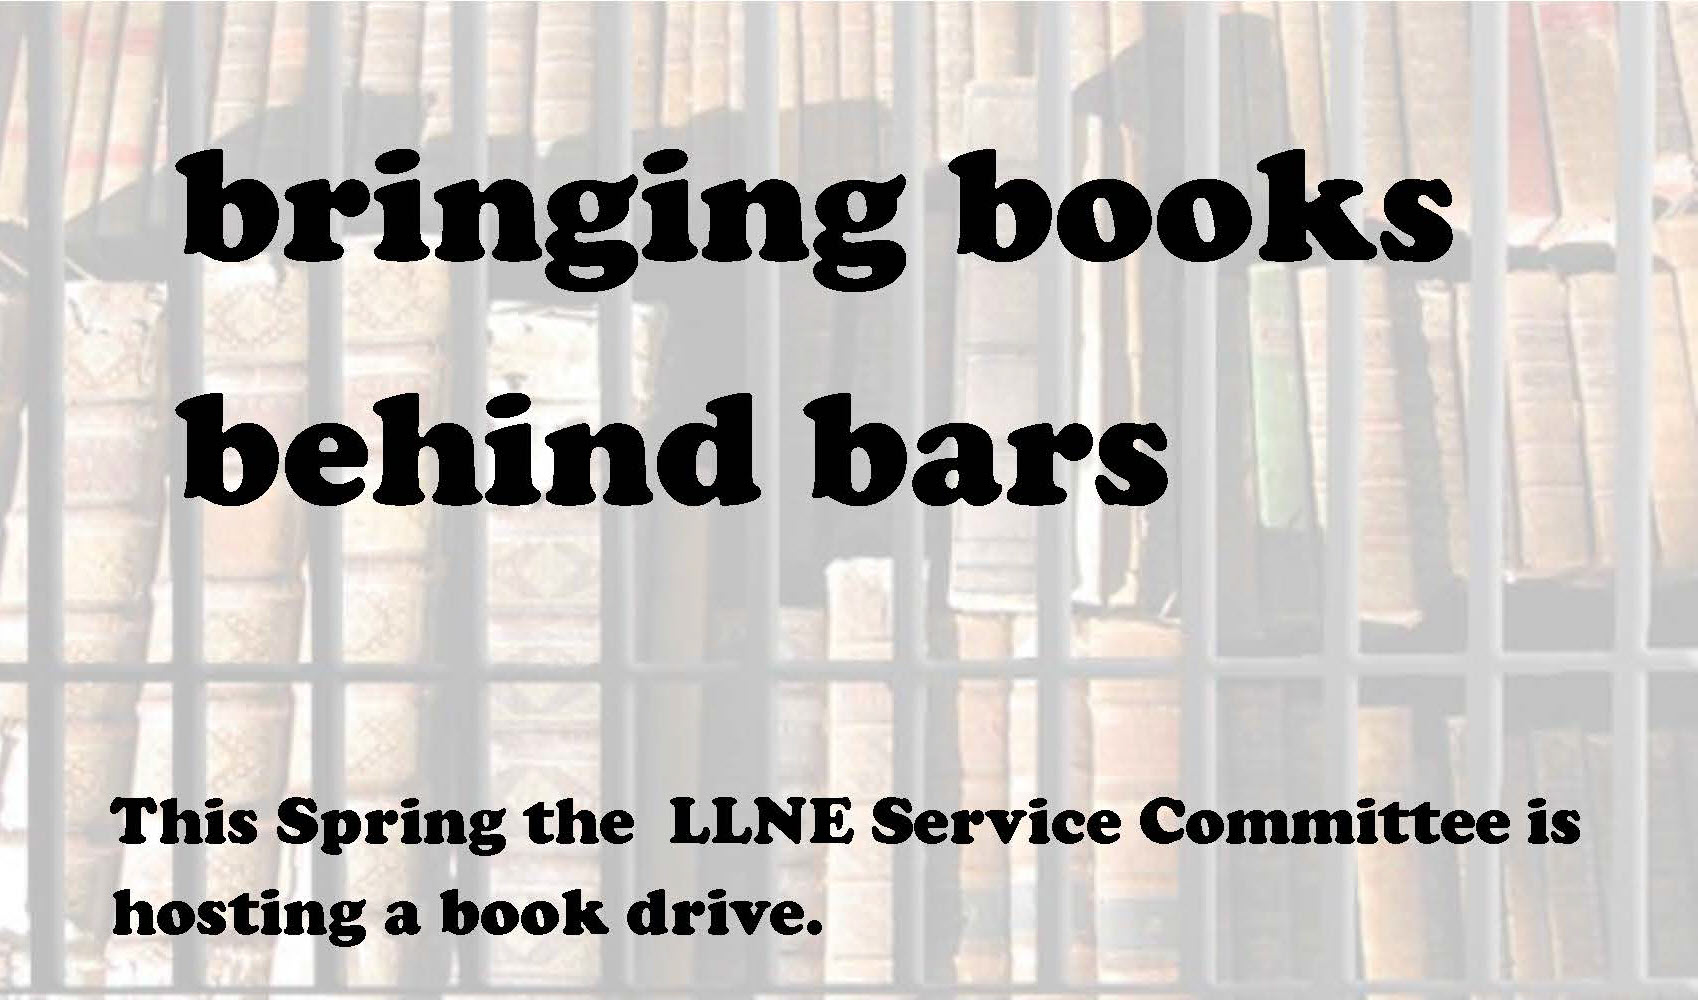 LLNE Spring Service Project - Copy